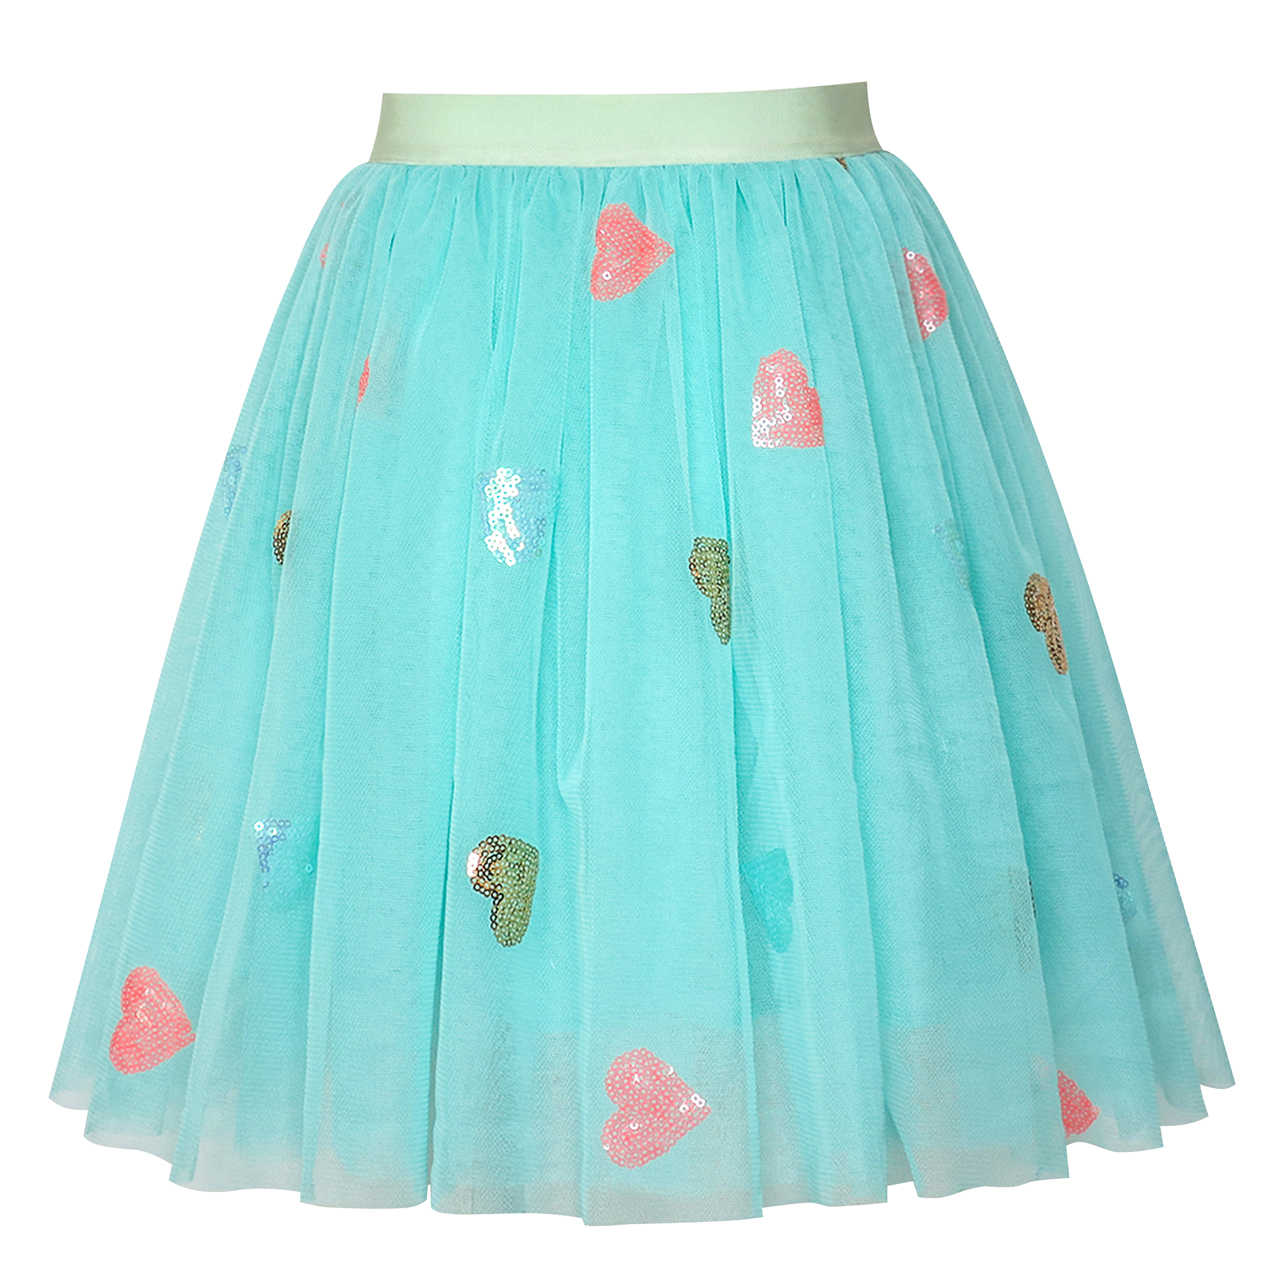 db3fee1f98 Girls Skirt Blue Heart Sequins Sparkling Tutu Dancing 2019 Summer Princess  Wedding Party Dresses Children Clothes